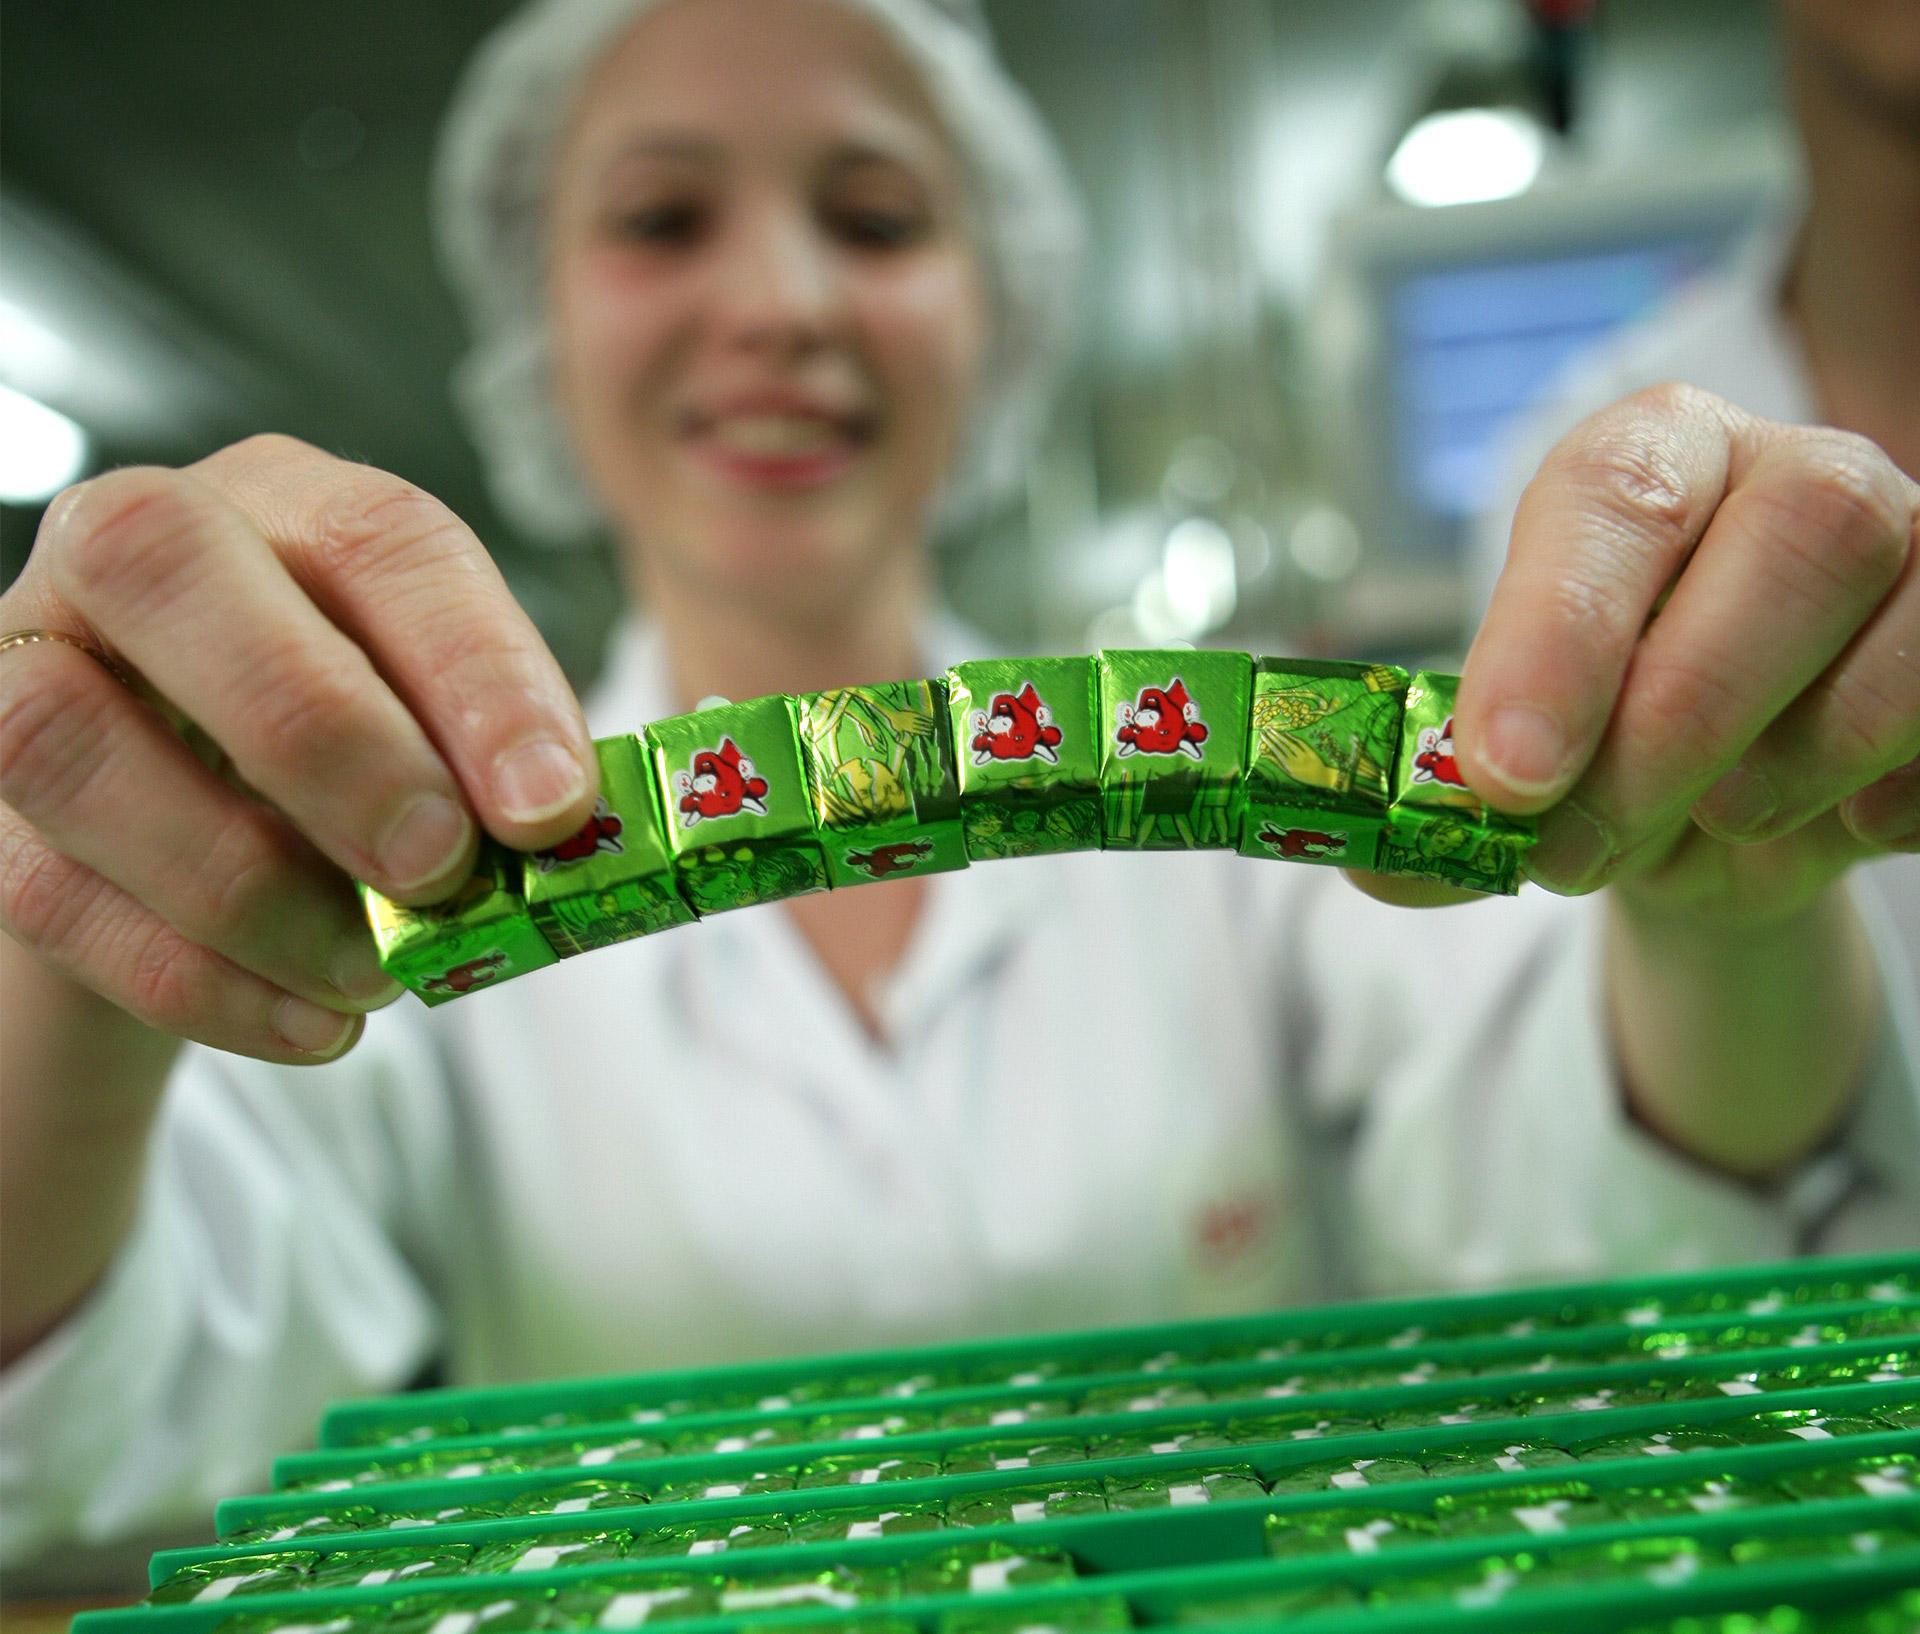 La conception d'huiles essentielles par Cosbionat, fabricant exclusif de la marque Dr Valnet